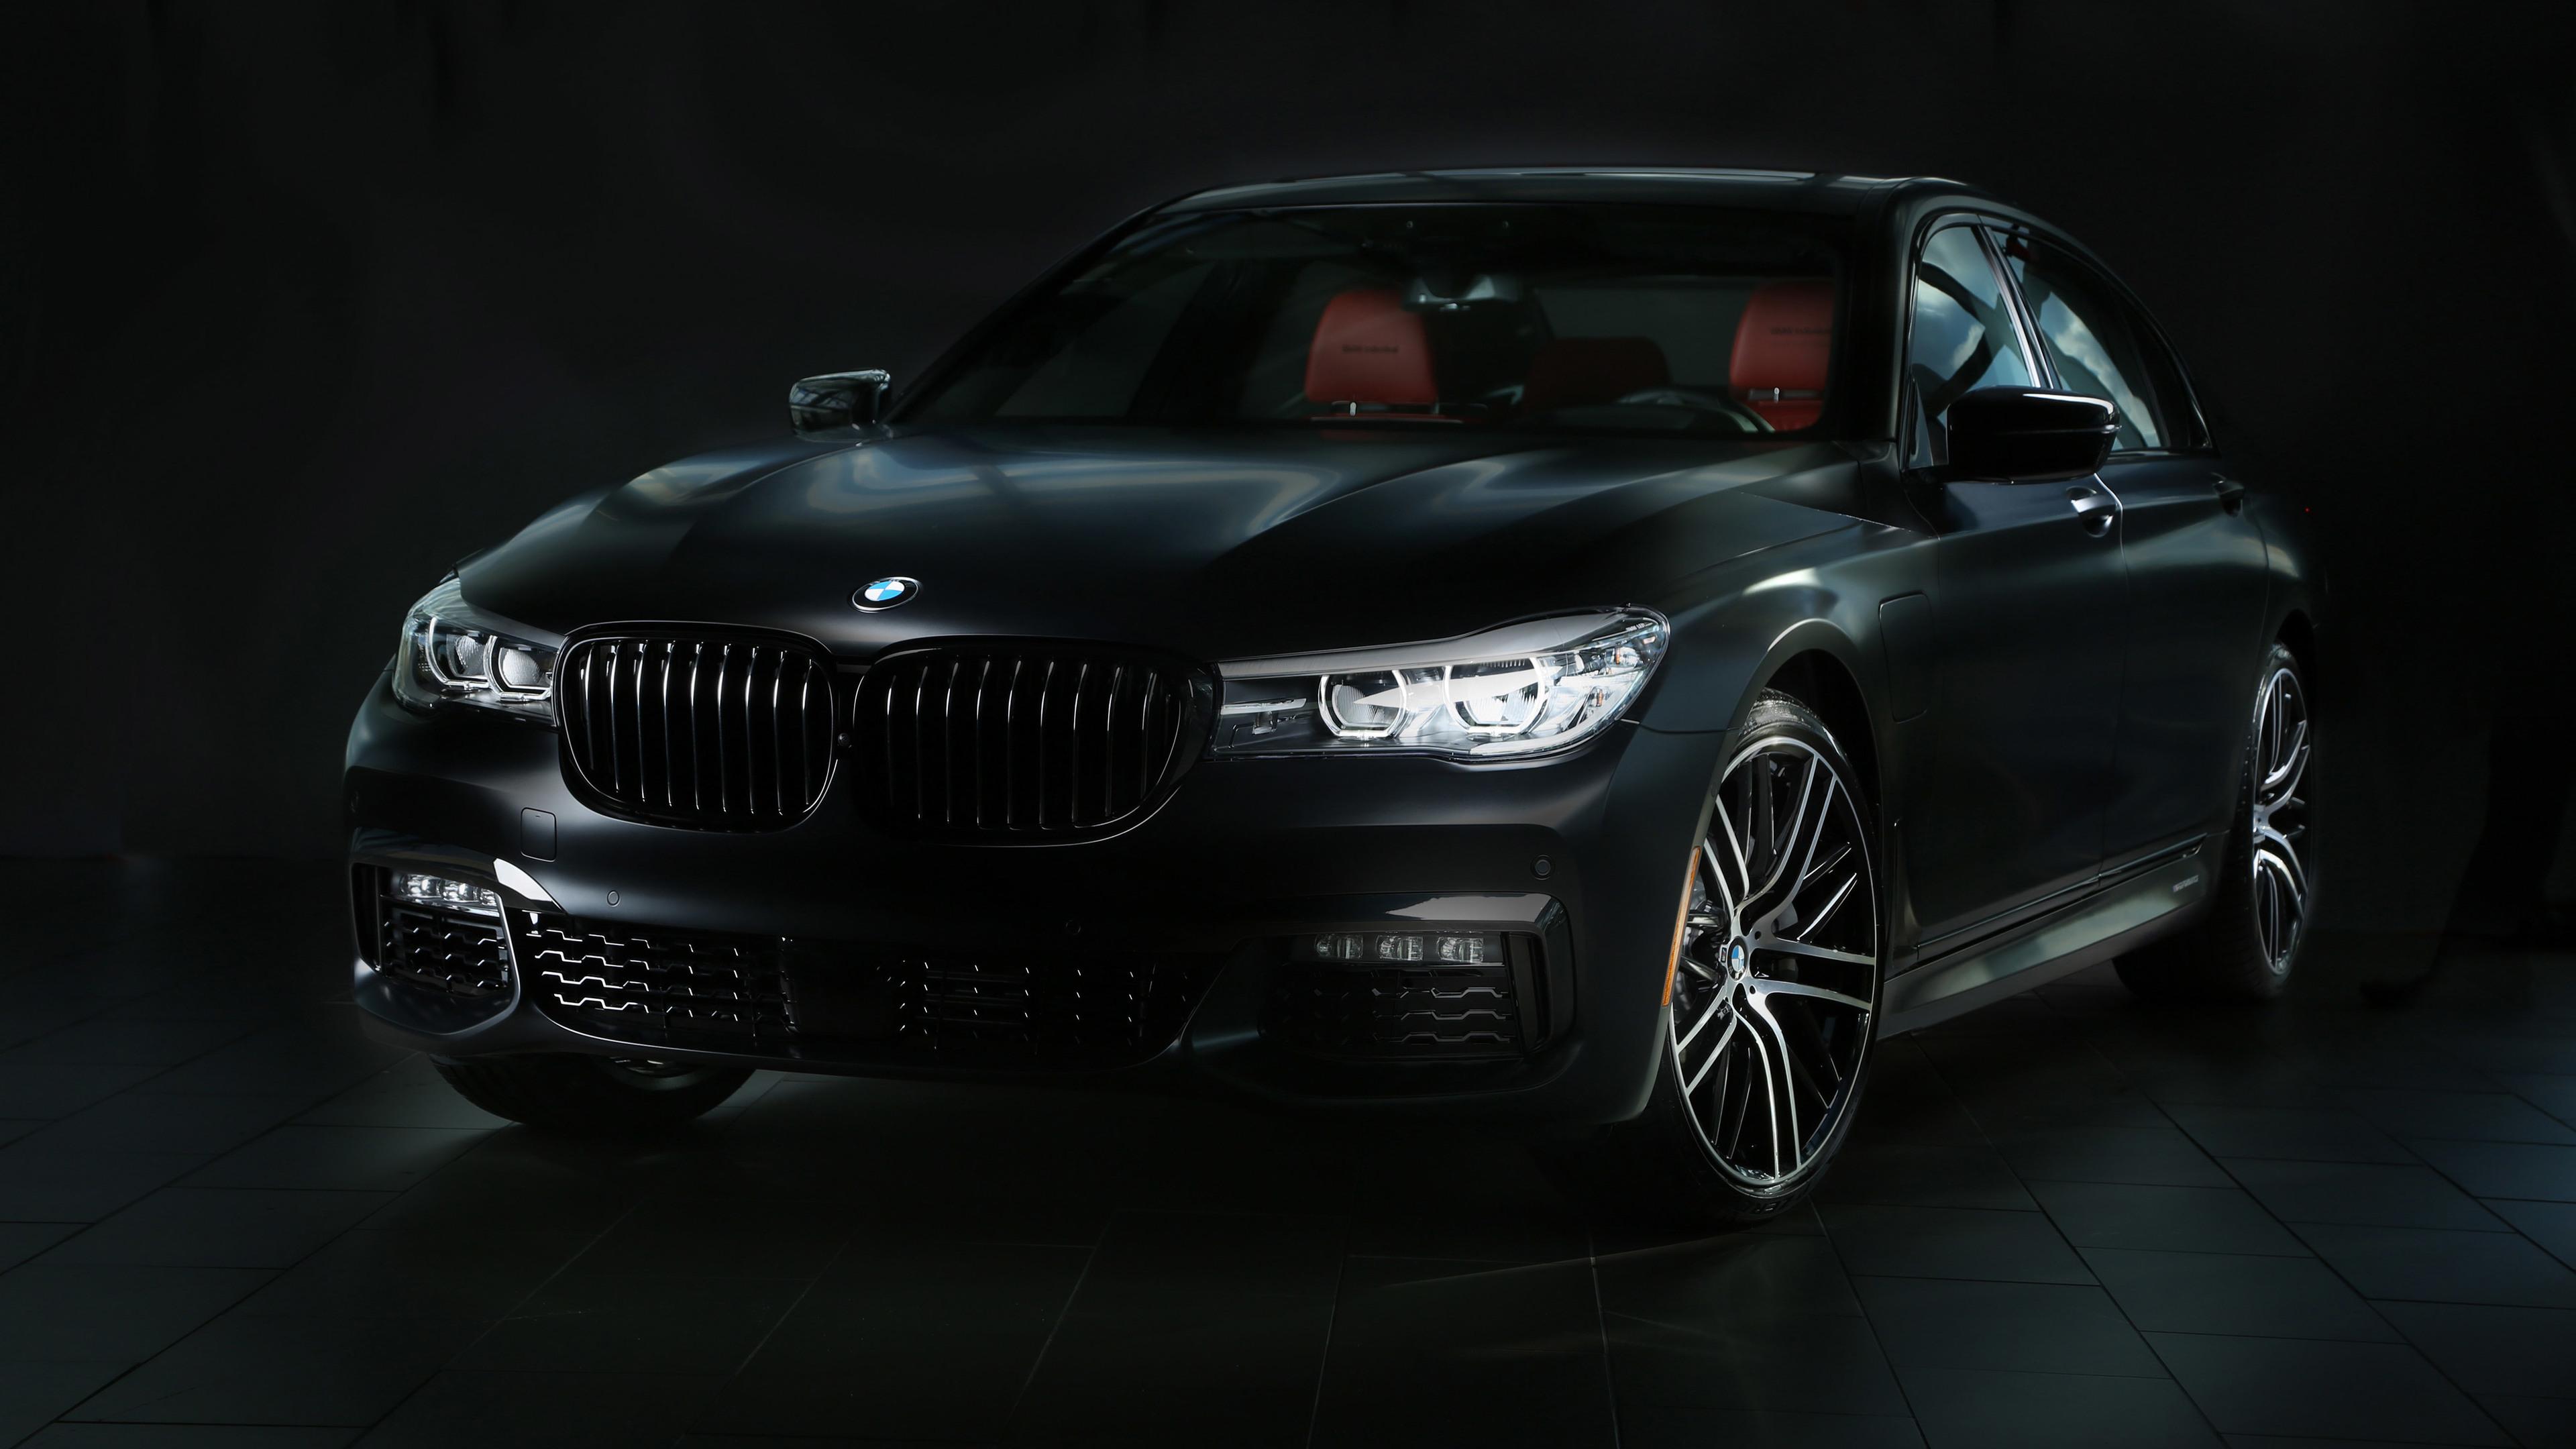 2017 bmw 740e iperformance m performance front 1539107567 - 2017 BMW 740e IPerformance M Performance Front - hd-wallpapers, cars wallpapers, bmw wallpapers, bmw 740 e wallpapers, 4k-wallpapers, 2017 cars wallpapers